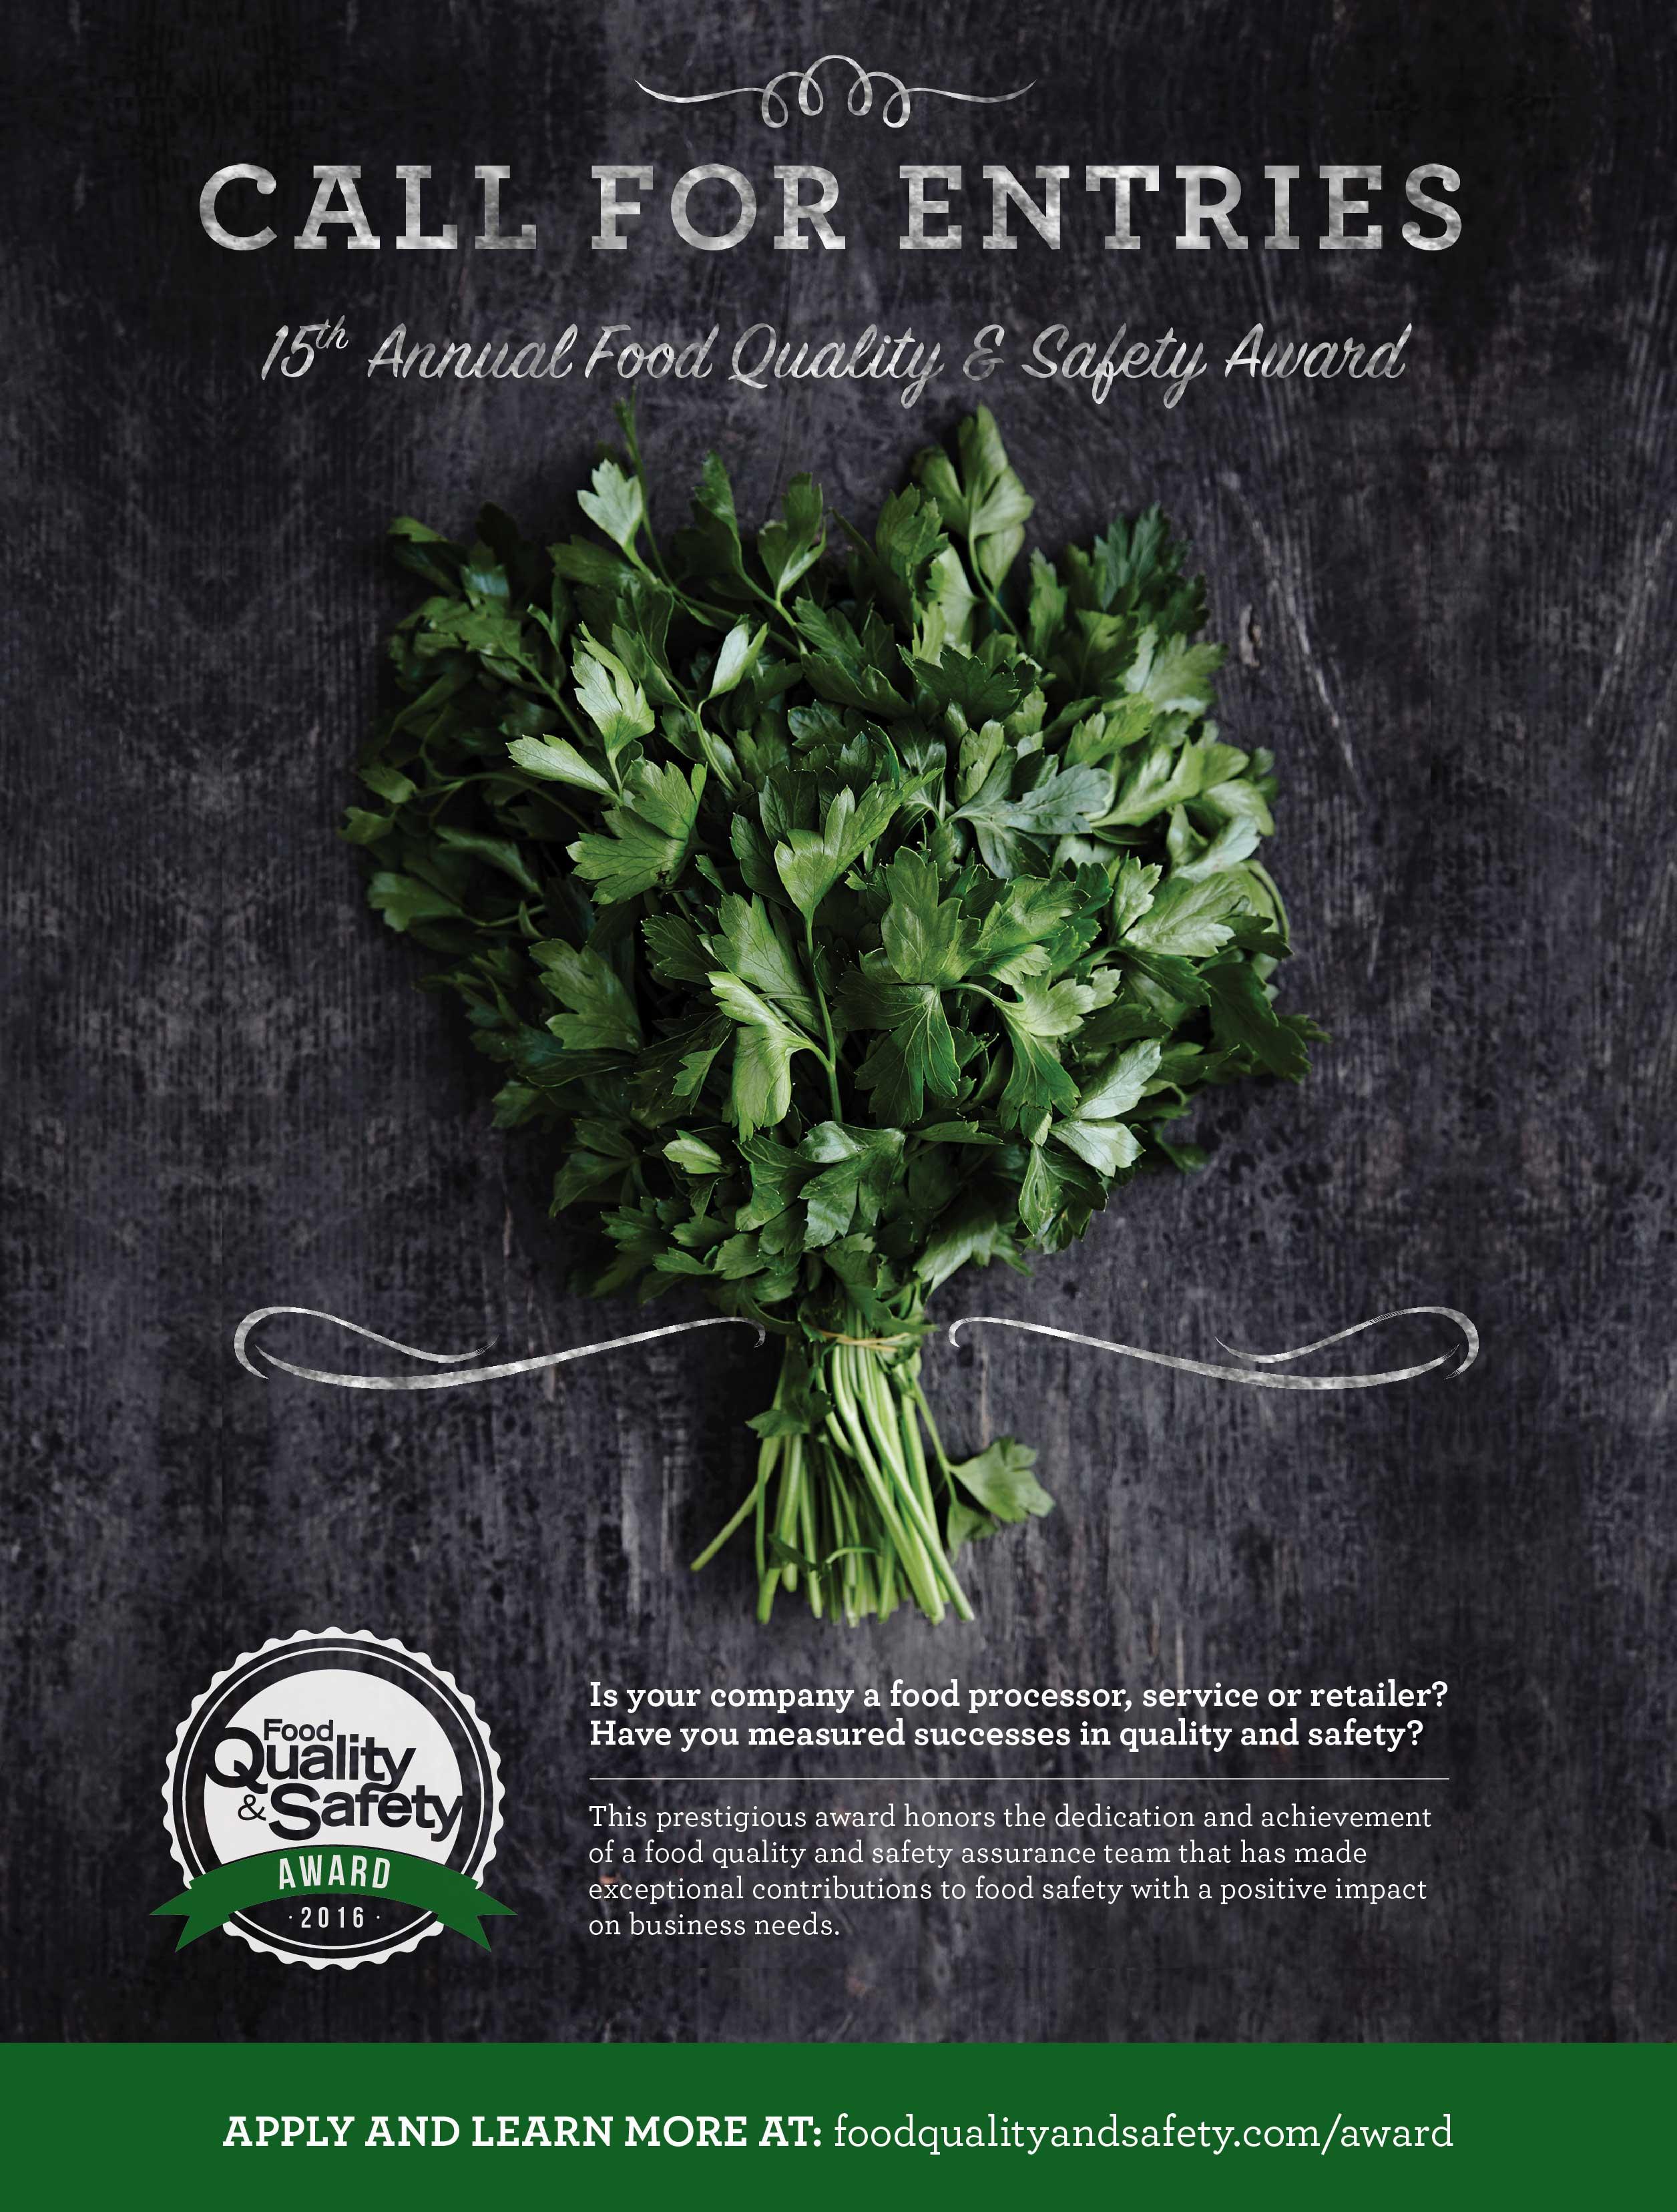 FQS_AwardCampaign_Final-02-web